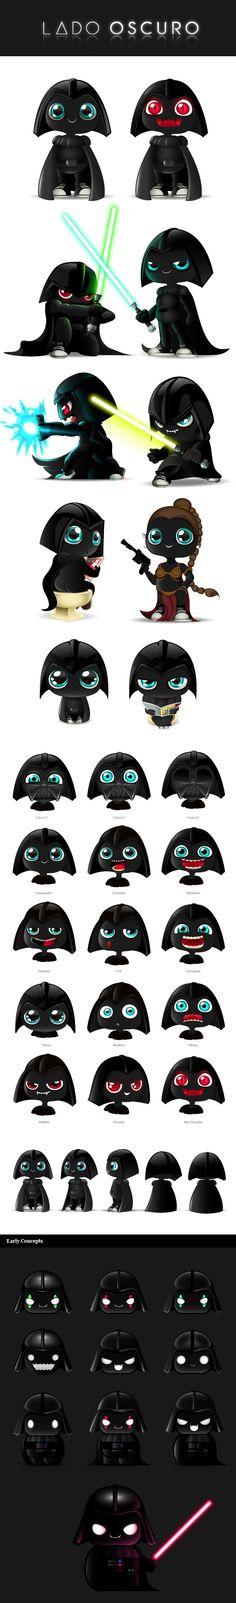 Character Design (2012-2013) by Juan Casini, via Behance